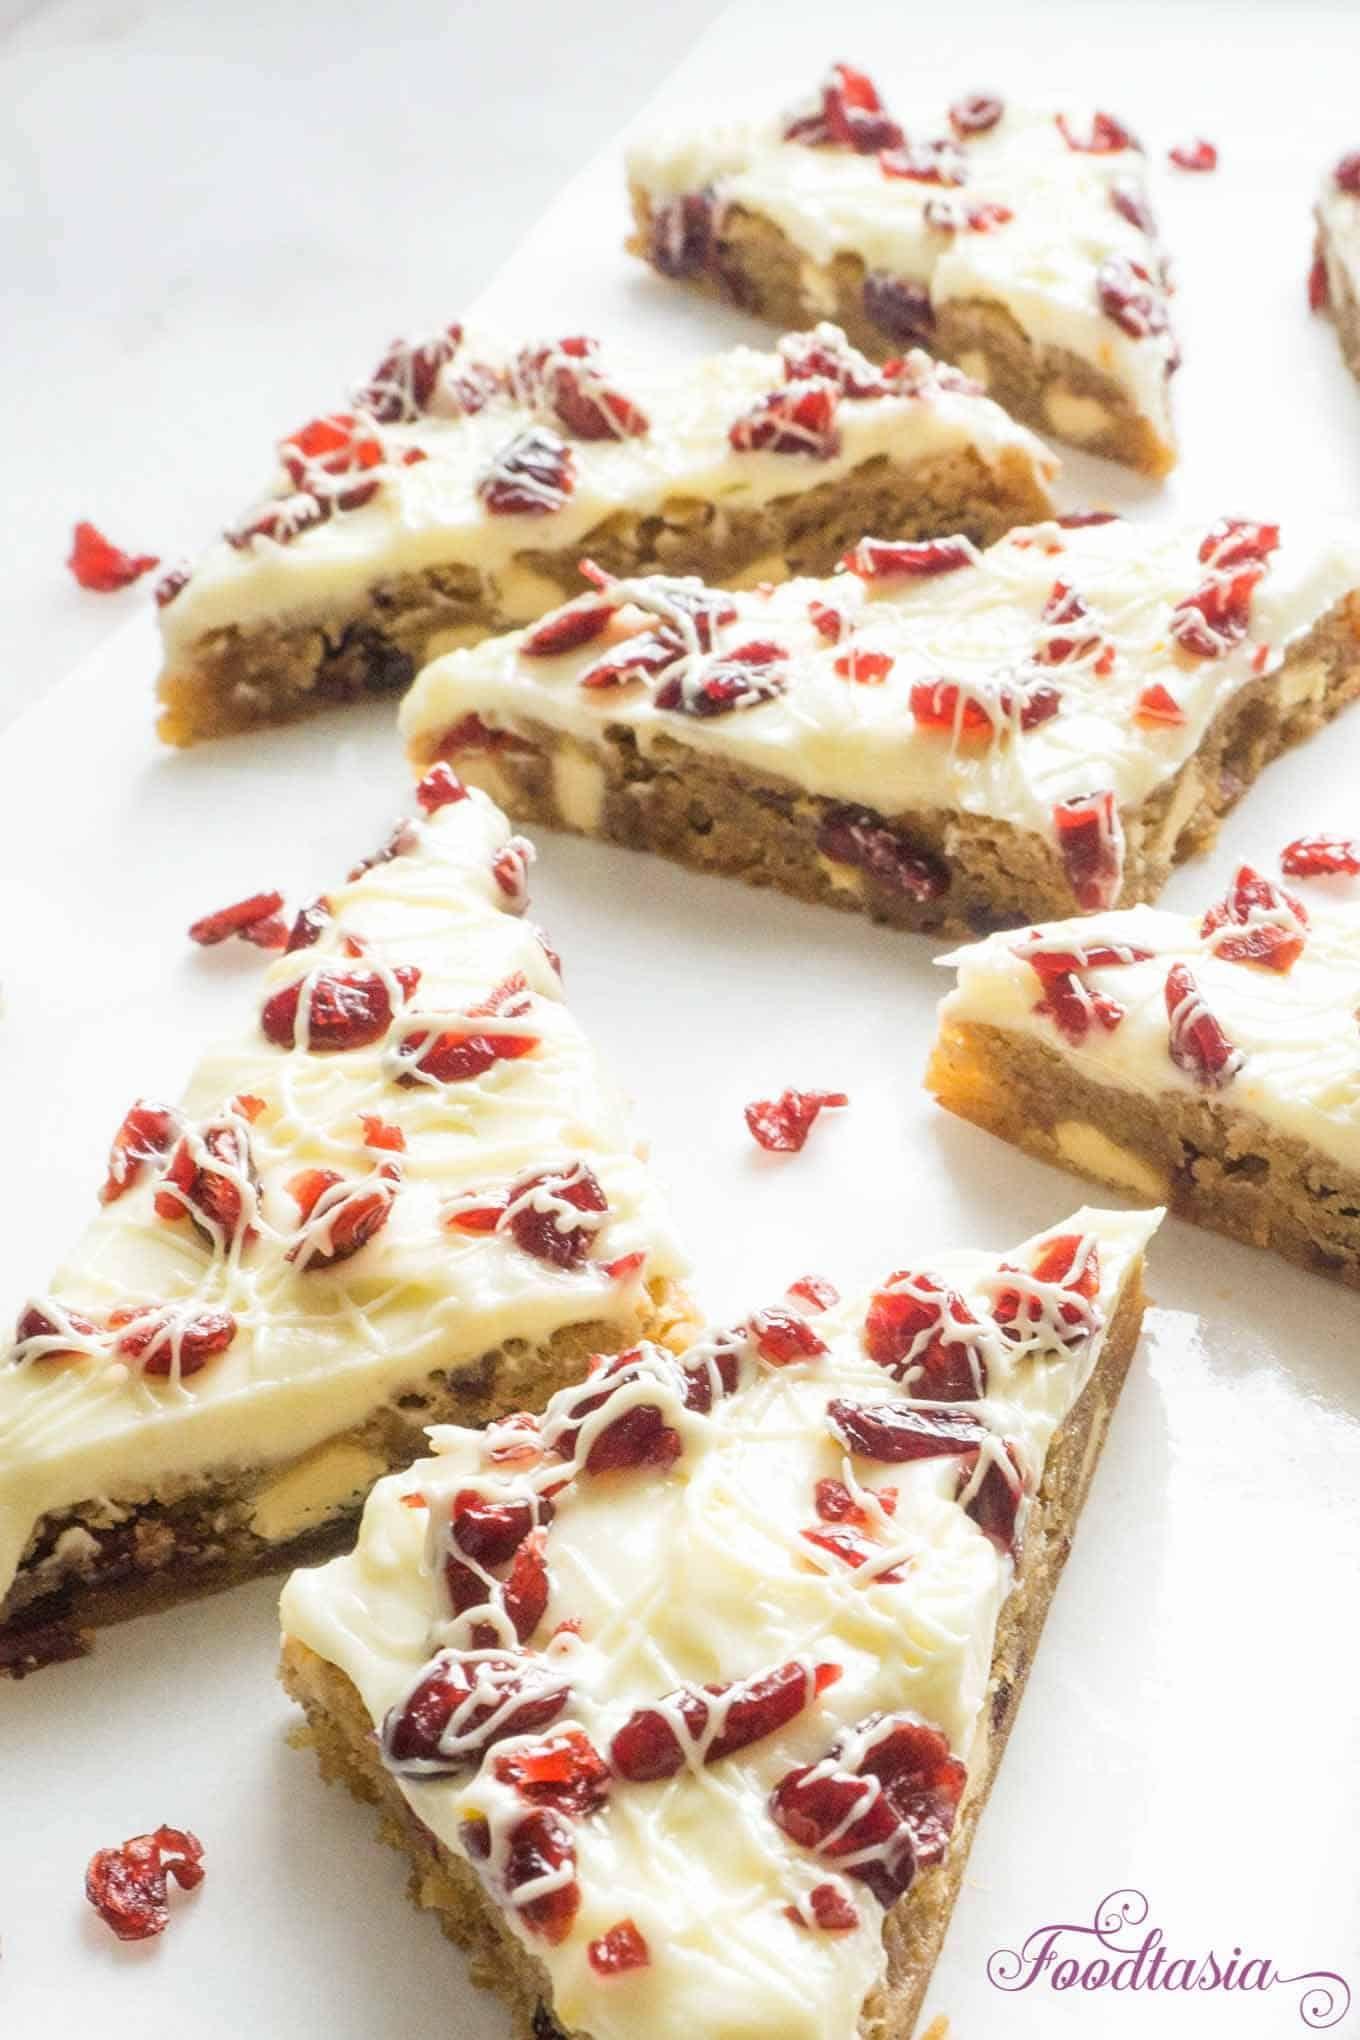 Cranberry Bliss Bars (Starbucks Copycat) | Foodtasia